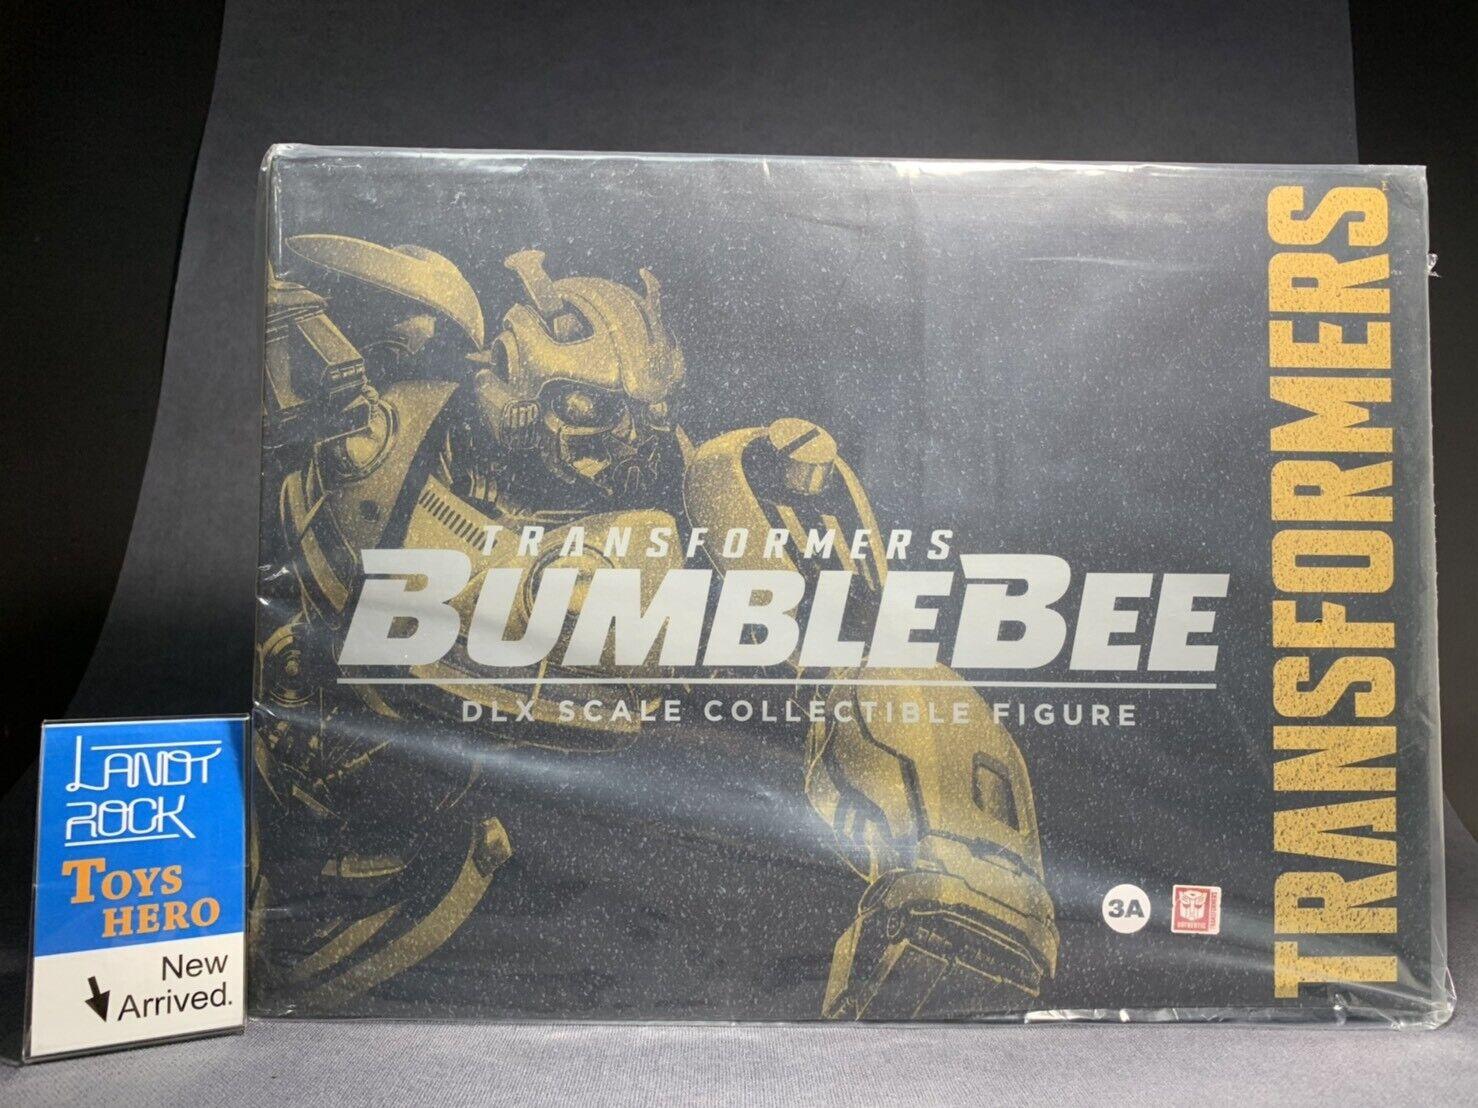 [giocattoliHero] In He Hasbro ThreeA x x x Transformers BUMBLEBEE Scale 8  azione cifra 1d3ddd